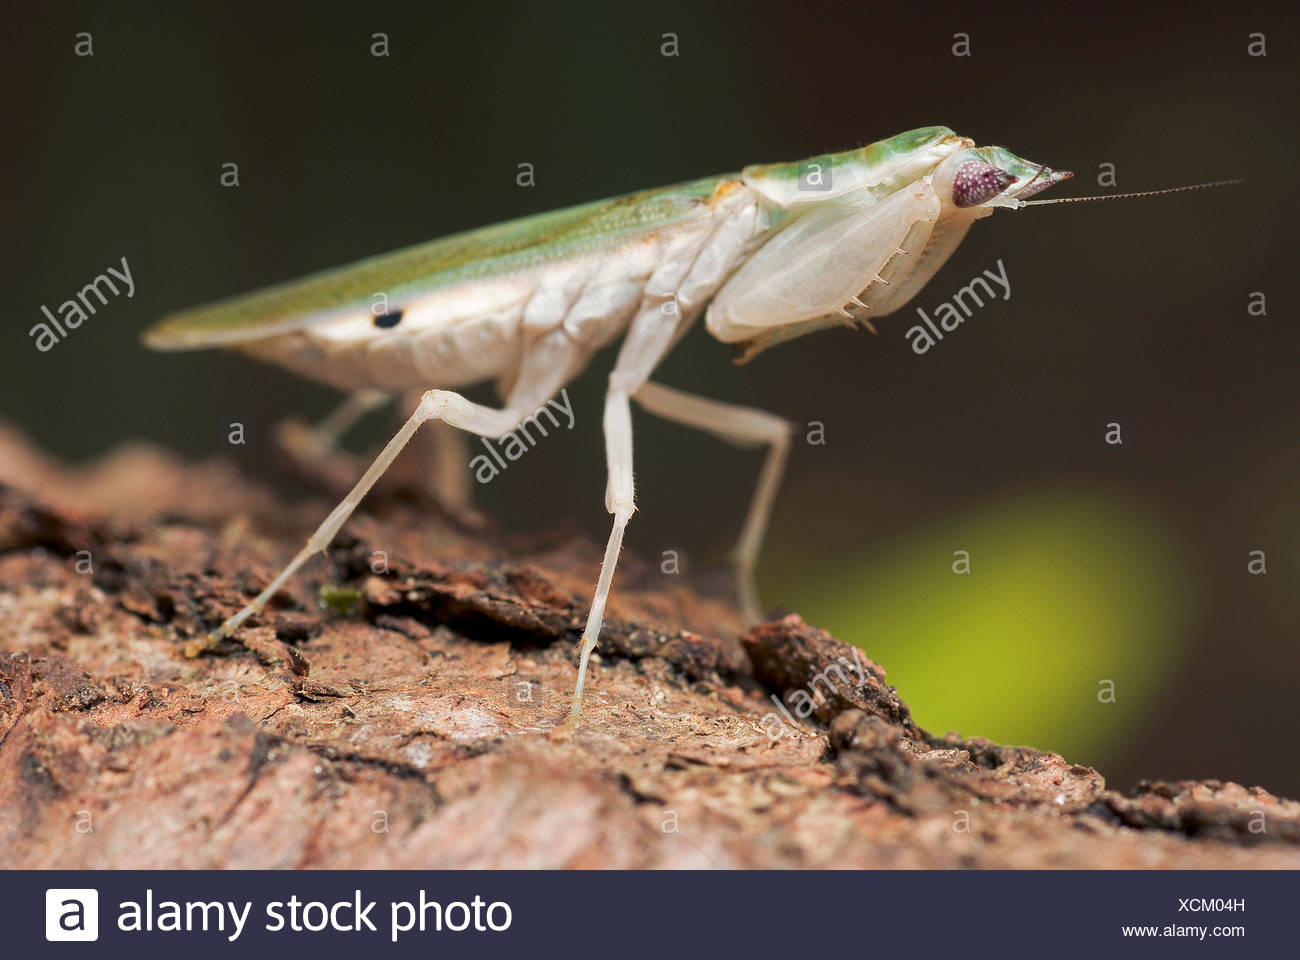 Gambian Spotted-eye Flower Mantis (Pseudoharpax virescens), female - Stock Image